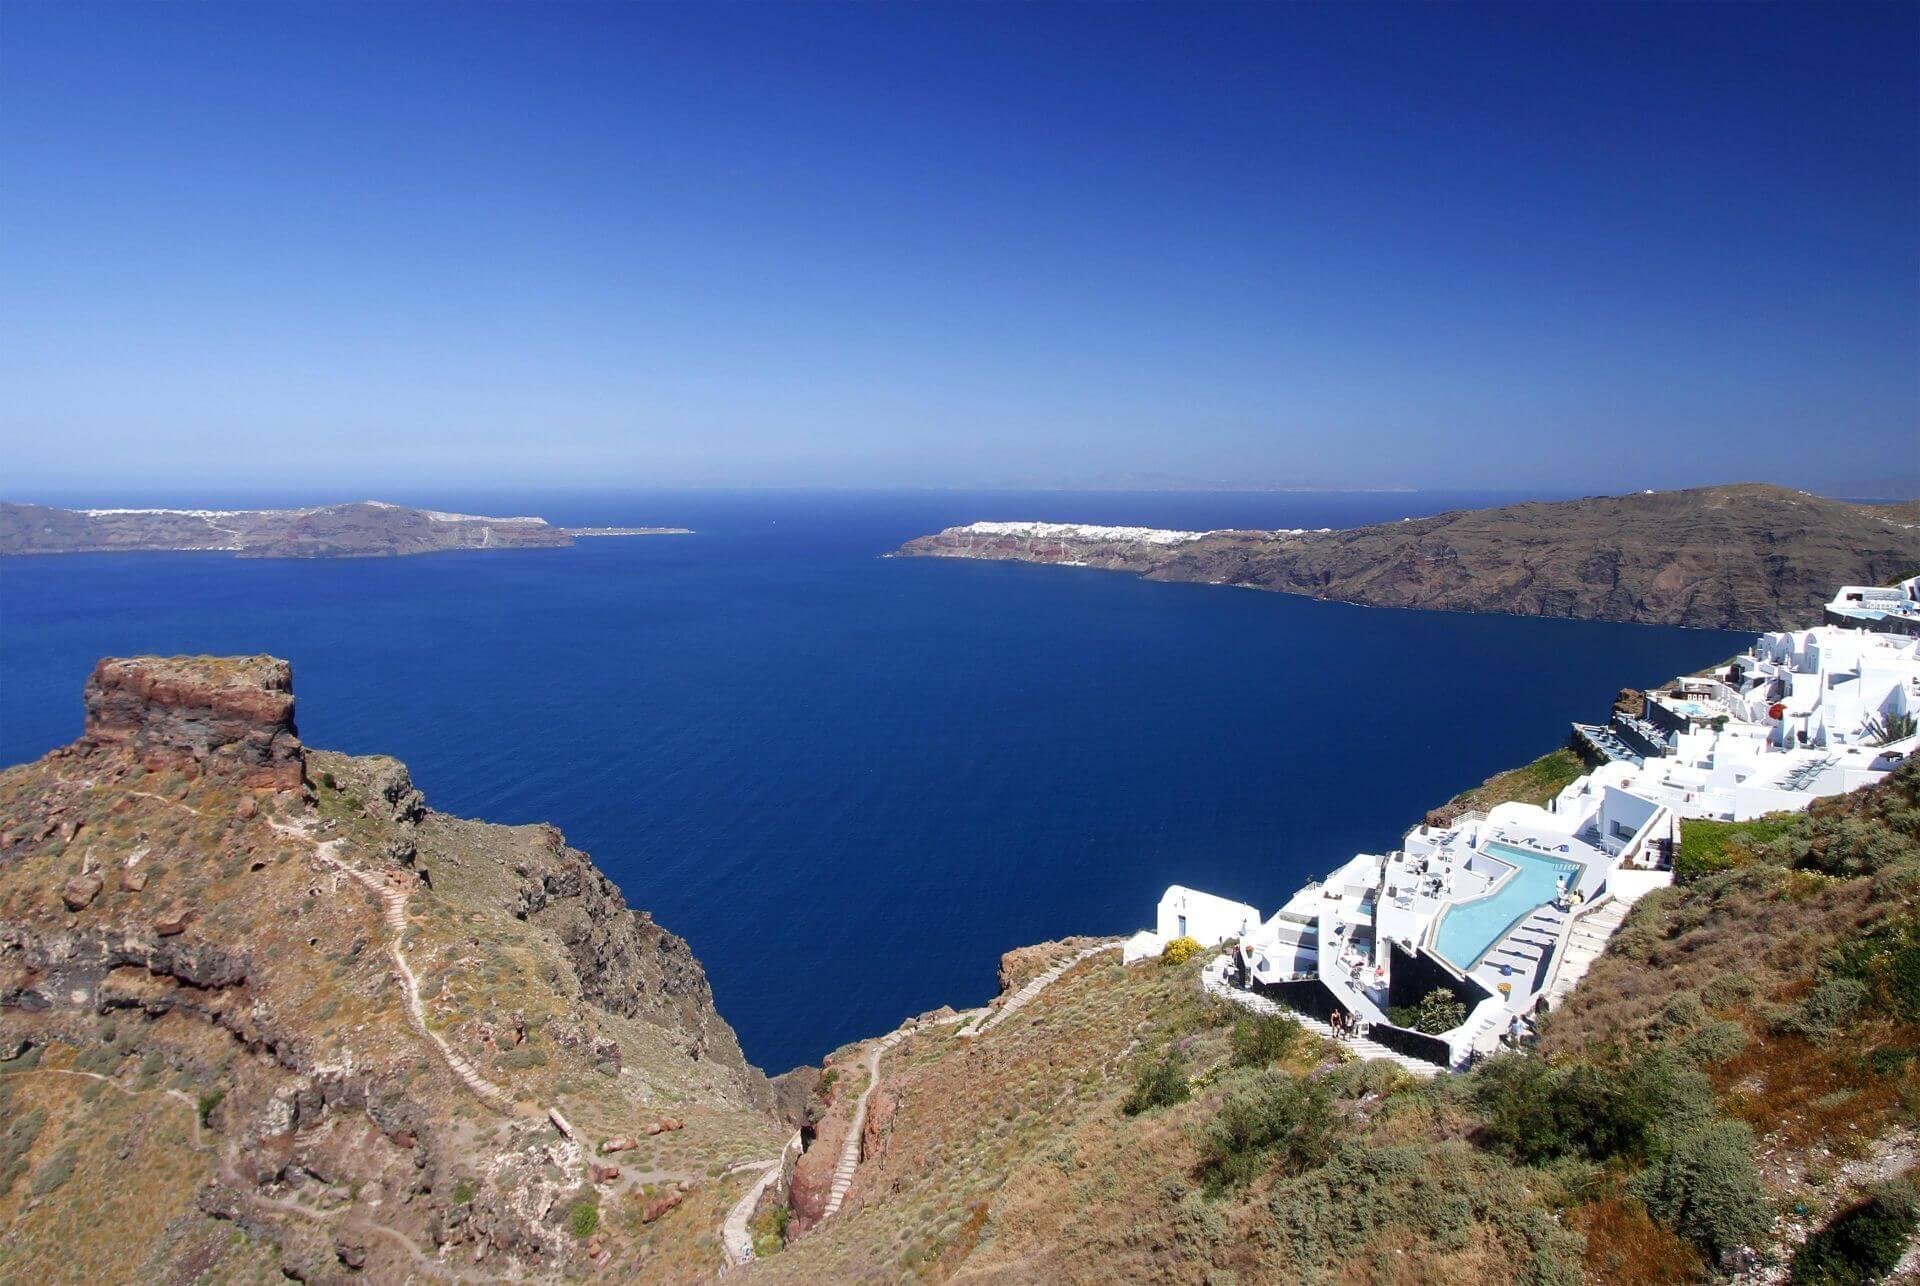 Santorini accommodation and hotels: Ambassador hotel